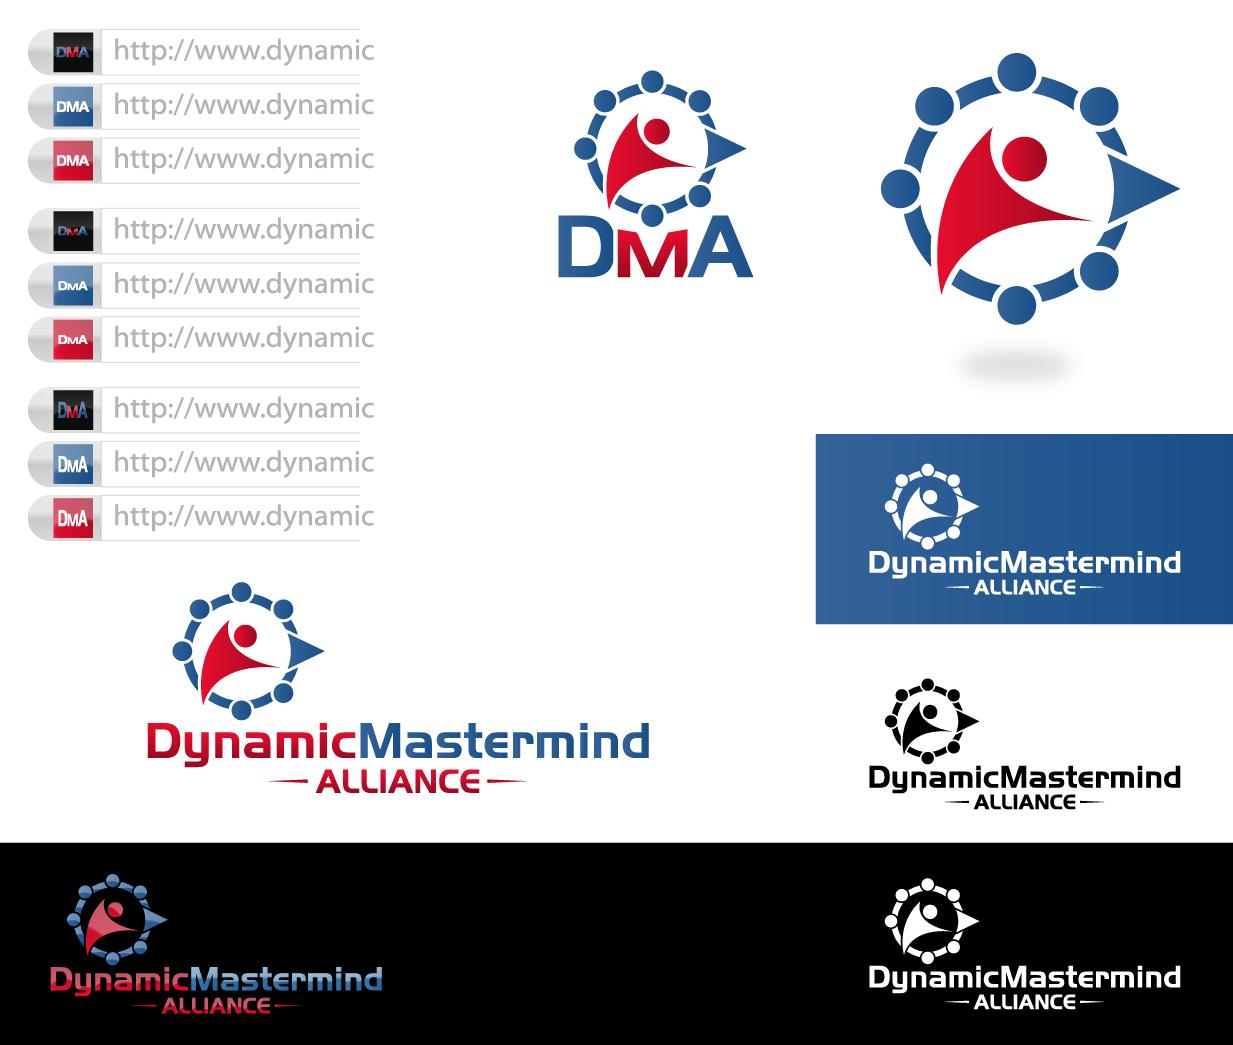 Create the next logo for Dynamic Mastermind Alliance